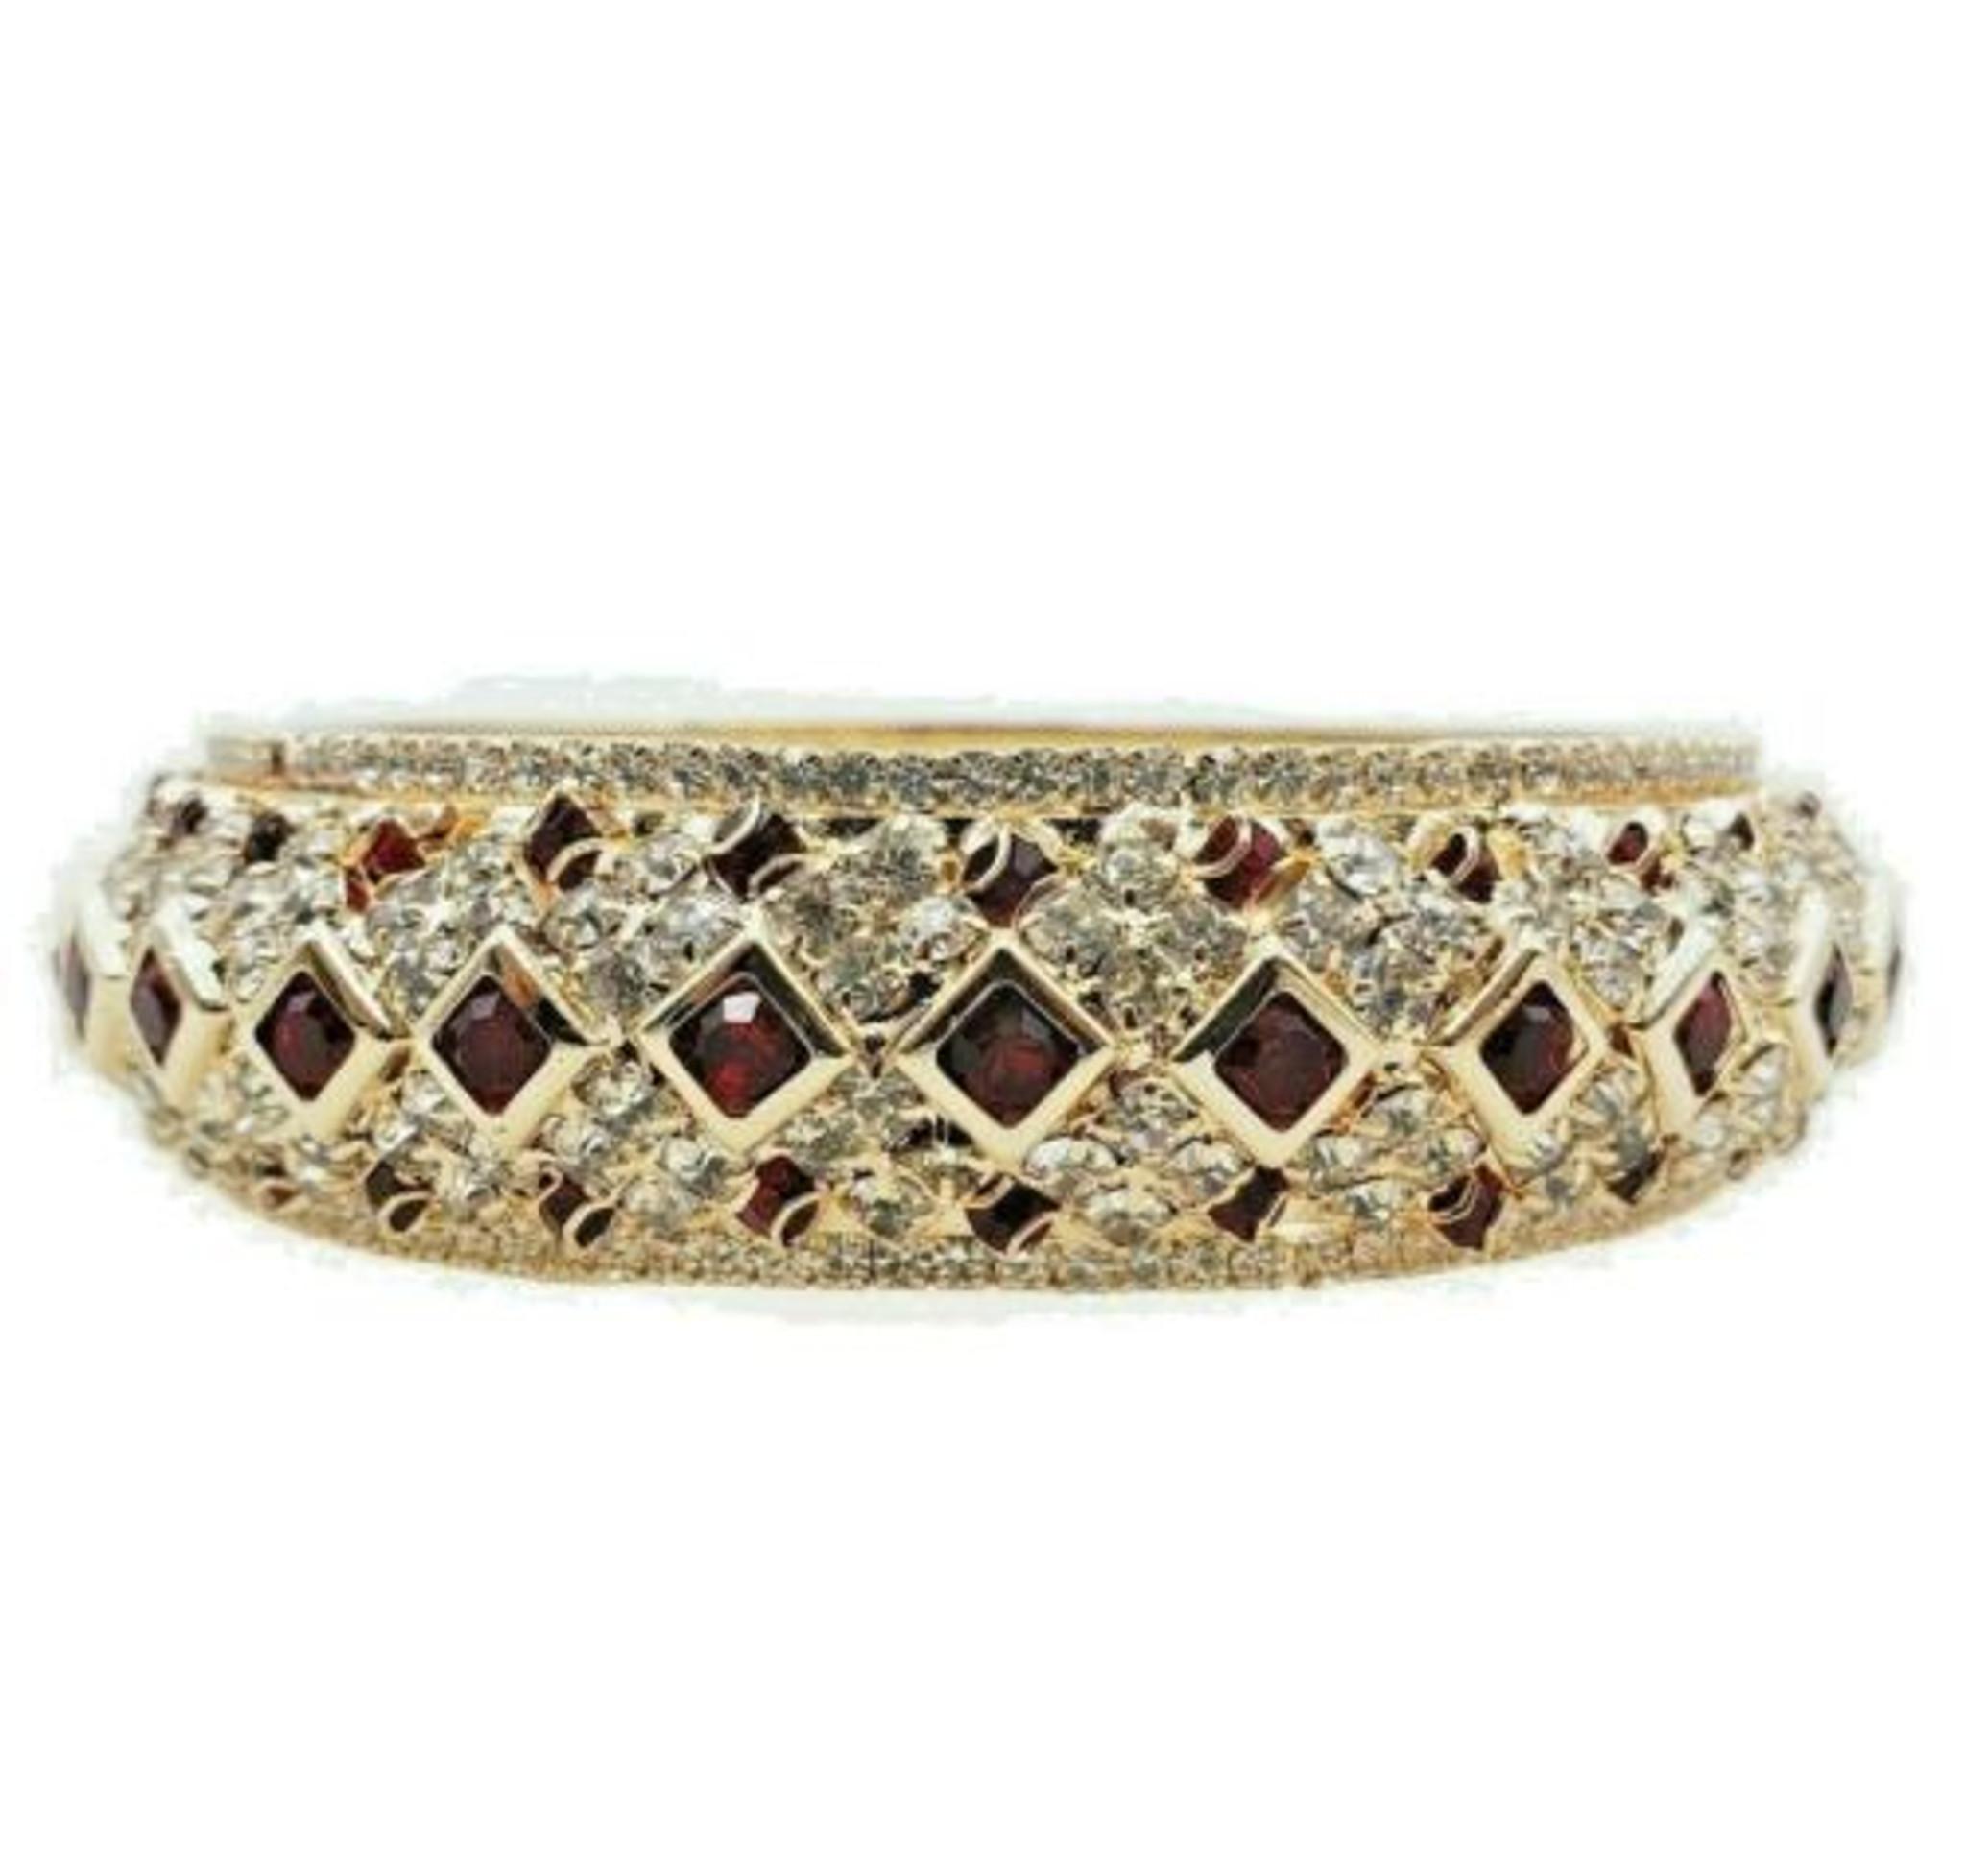 Bollywood Bangle Chunky Wedding Jewelry Gold Plated Rhinestone | NO8 - Size 210